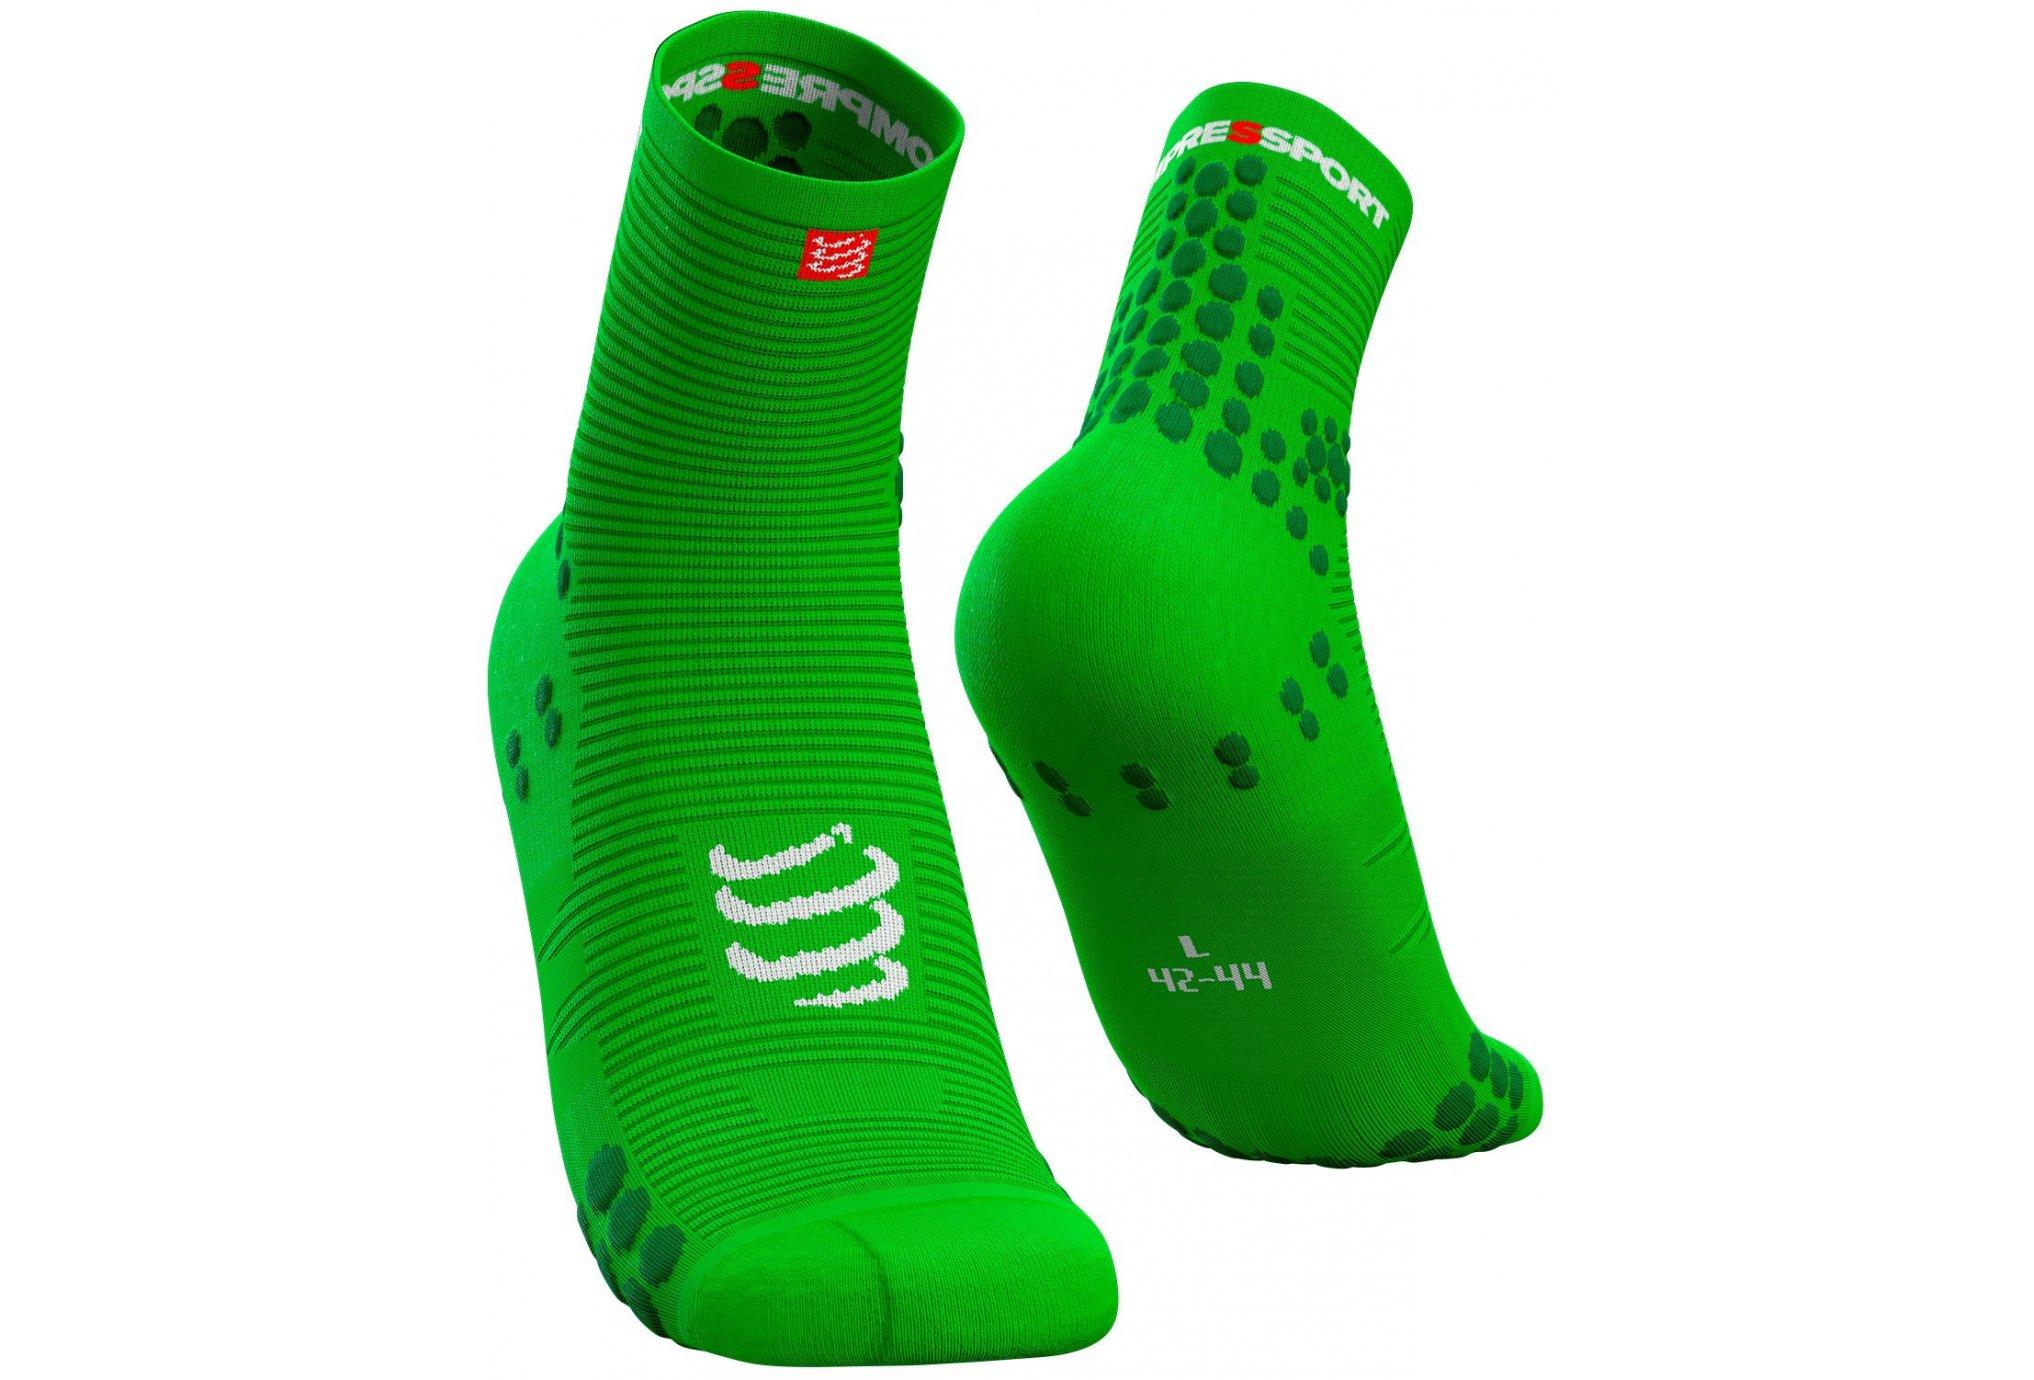 Compressport Pro Racing V 3.0 Run High Summer Refresh 2021 Chaussettes